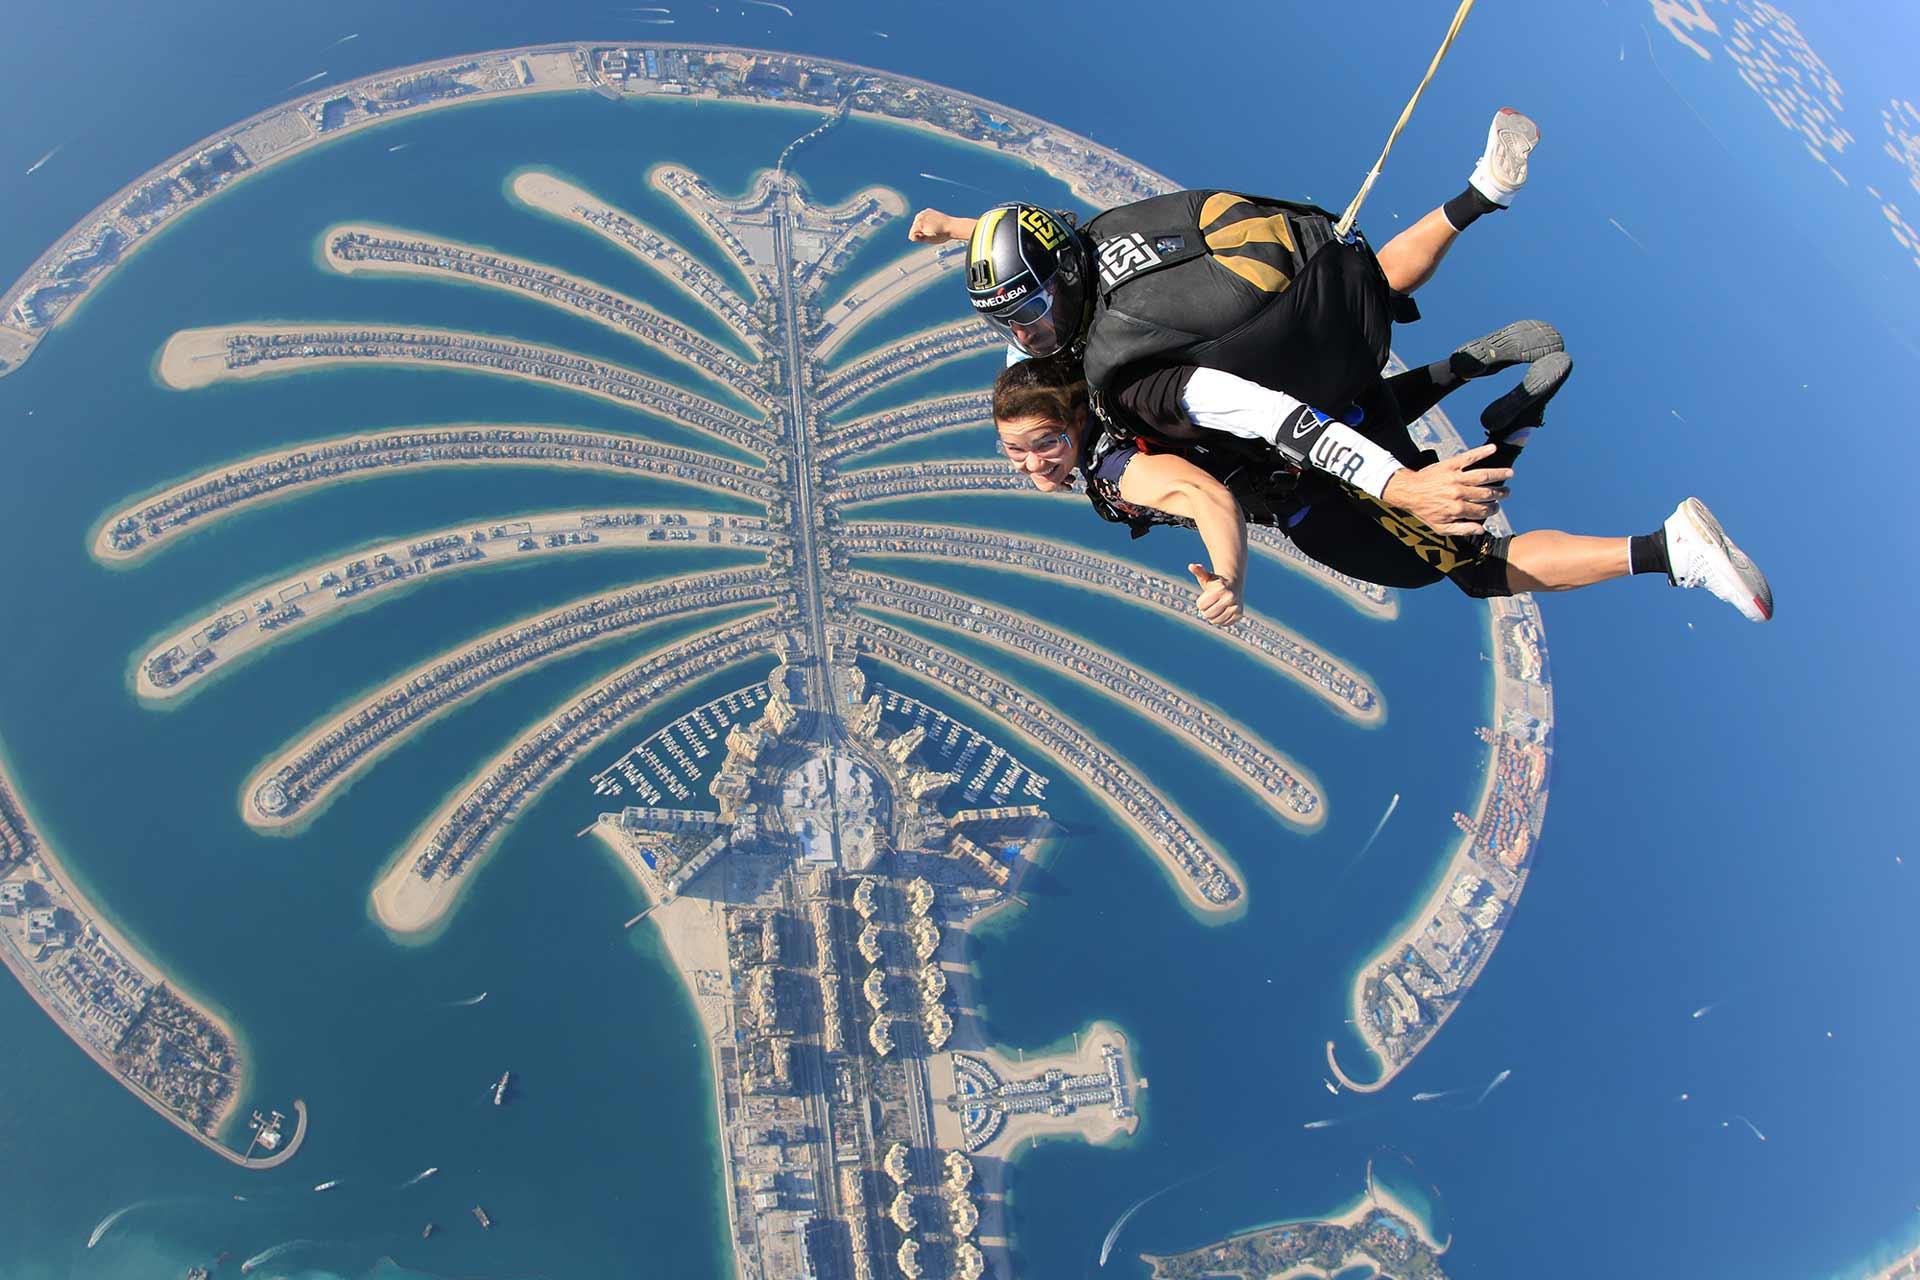 salto de paracaidismo sobre la palma de dubai